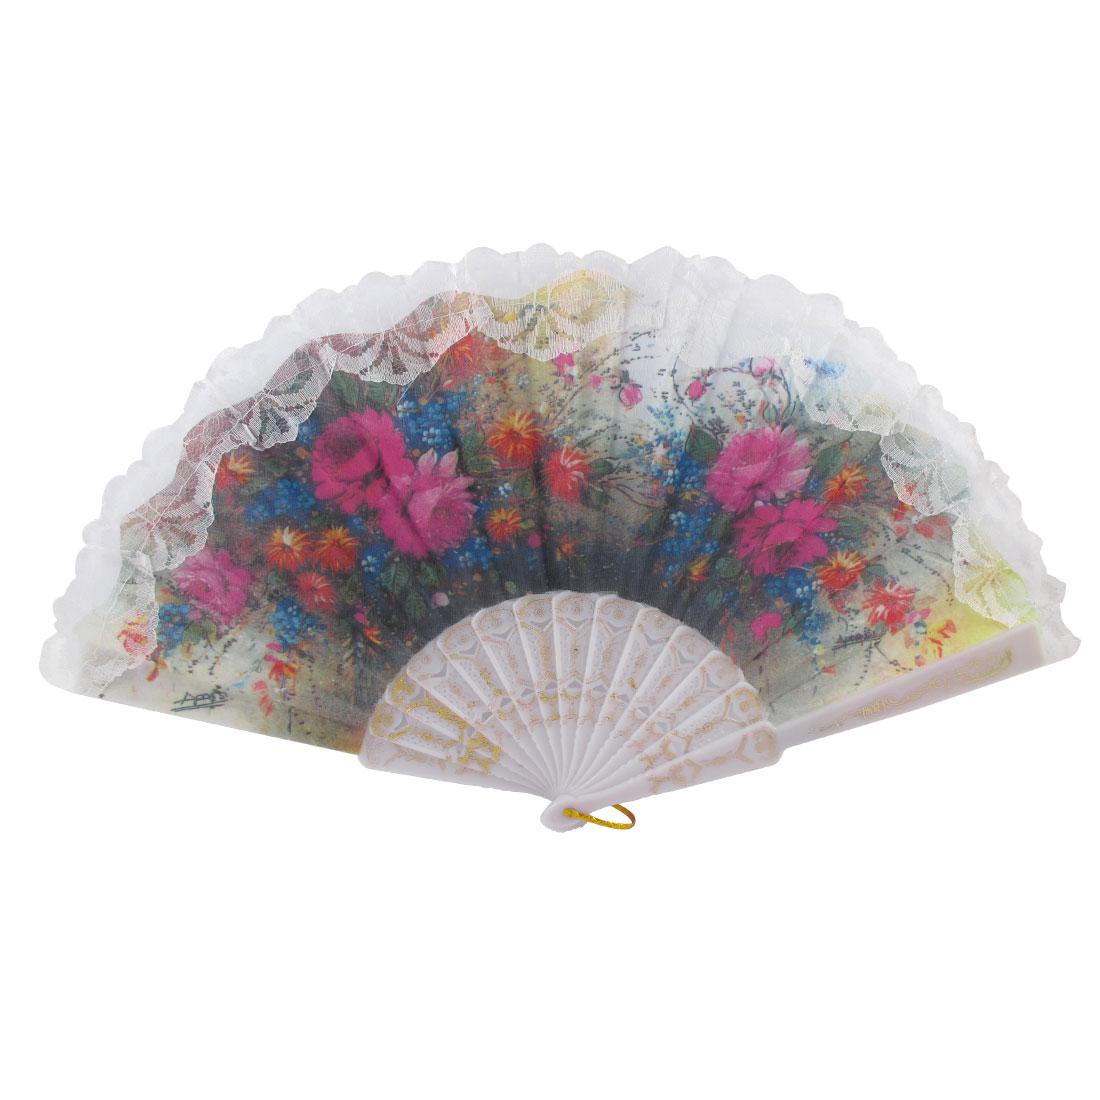 White Lace Edge Art Craft Folded Dancing Spanish Hand Fan Decorative Design